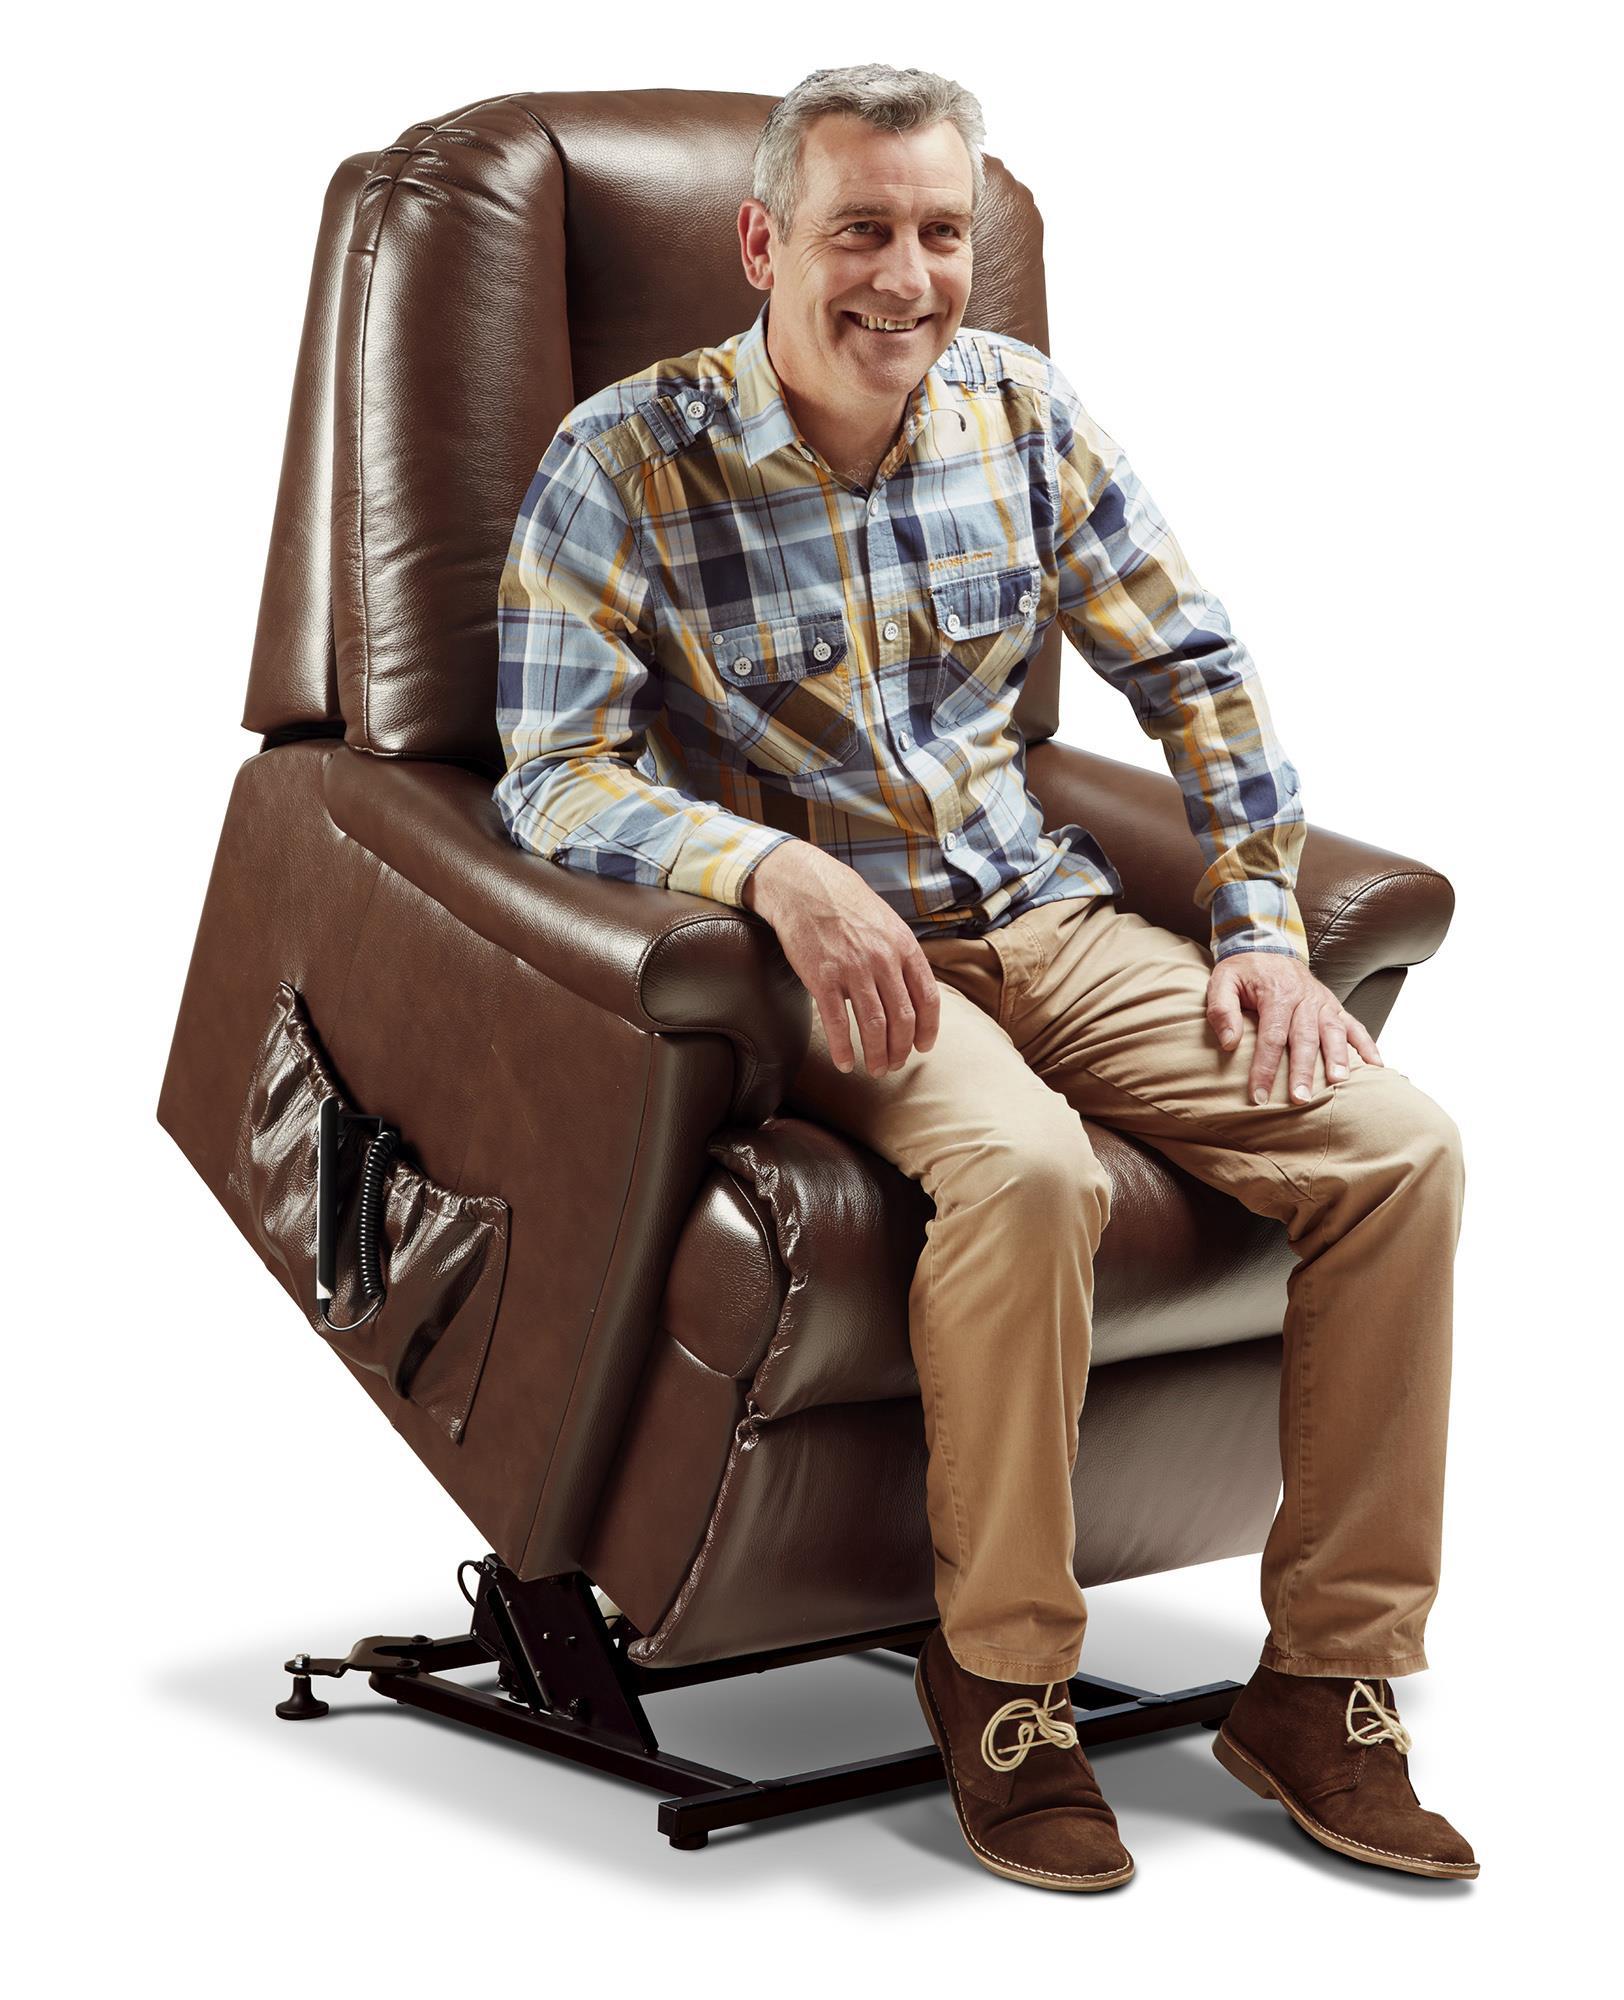 MILBURN - Chair Lift & Rise Recliners